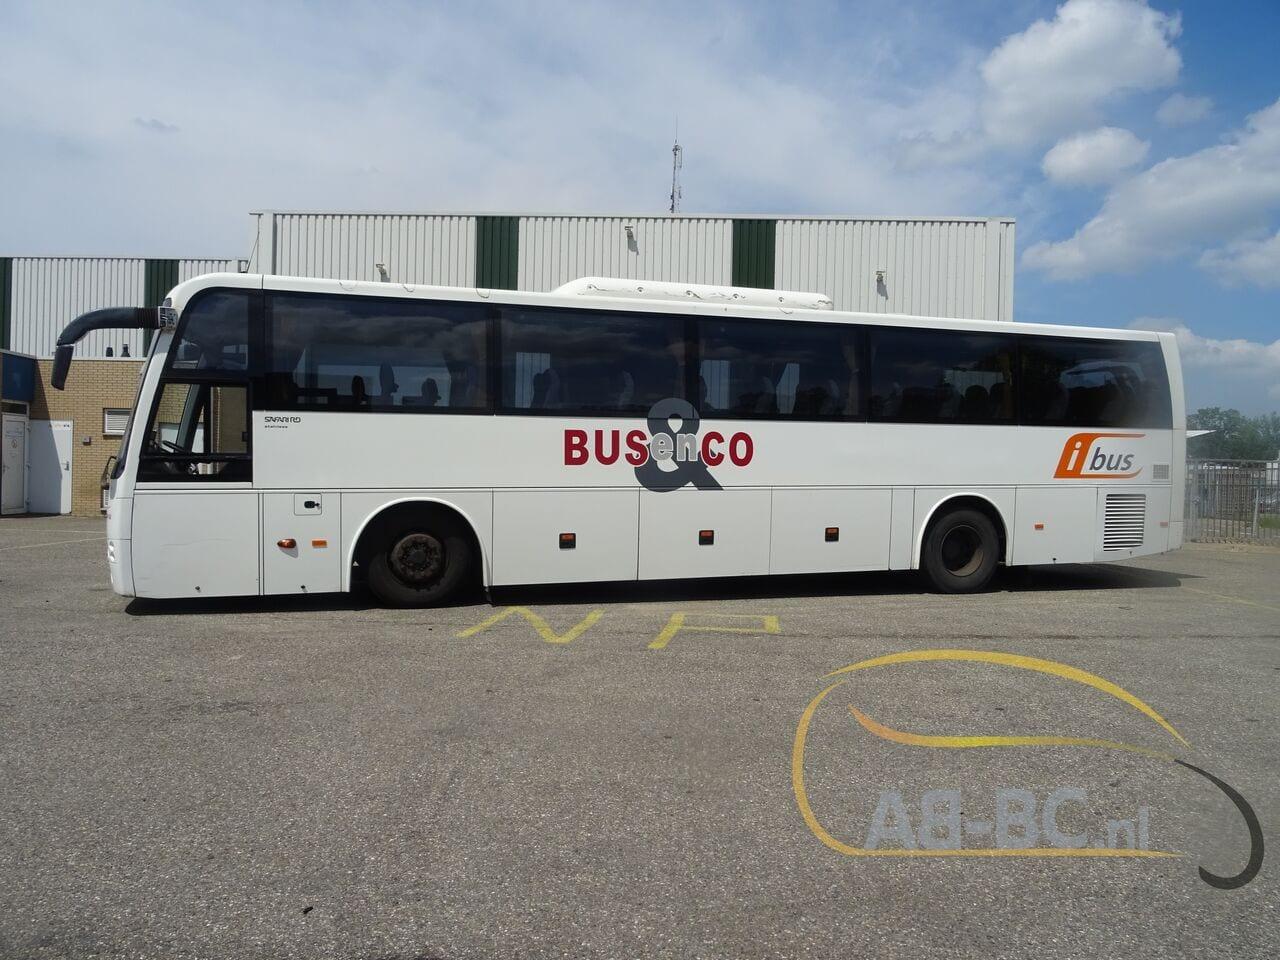 coach-busTEMSA-Safari-RD-DAF-Motor-53-Seats-Euro-5---1623932824115568608_big_478bfe3caedd04d5142d9dca9b3815a0--21061715155620919600